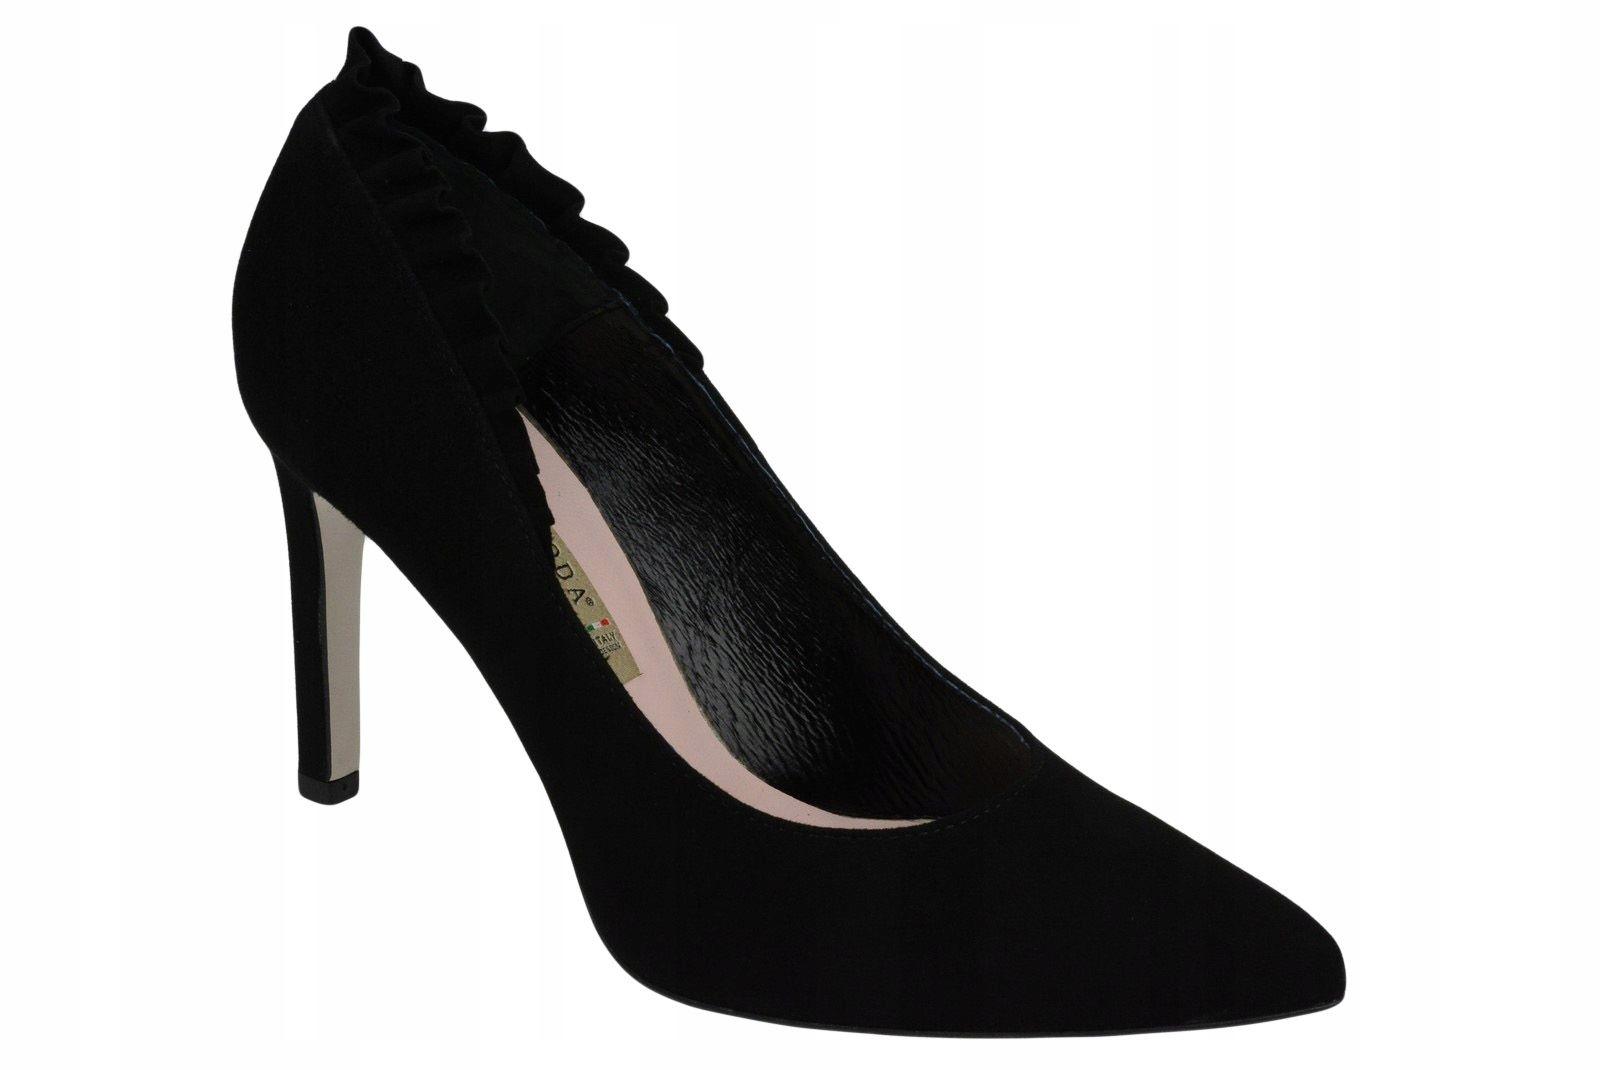 Bravo Moda Szpilki Czarne Skora 1600 38 7695101784 Oficjalne Archiwum Allegro Stiletto Heels Heels Stiletto